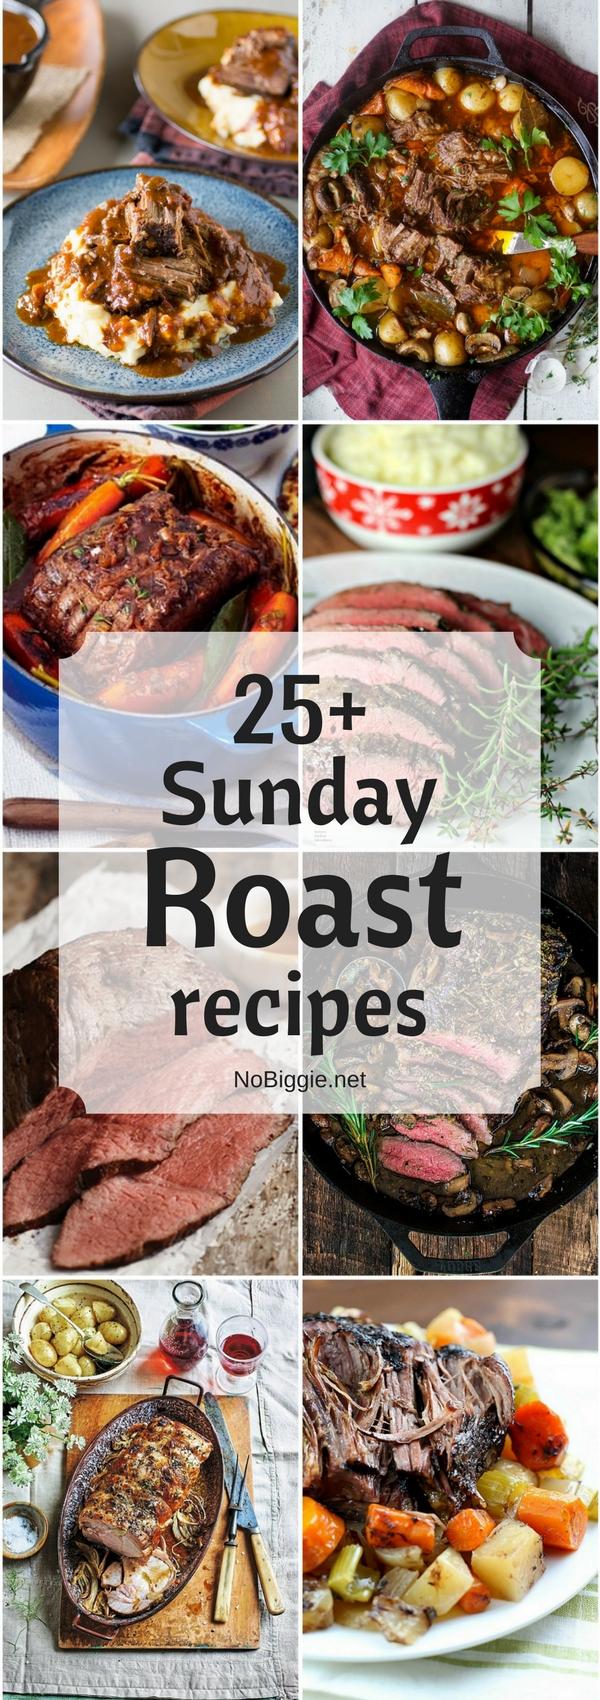 25+ Sunday Roast Recipes | NoBiggie.net